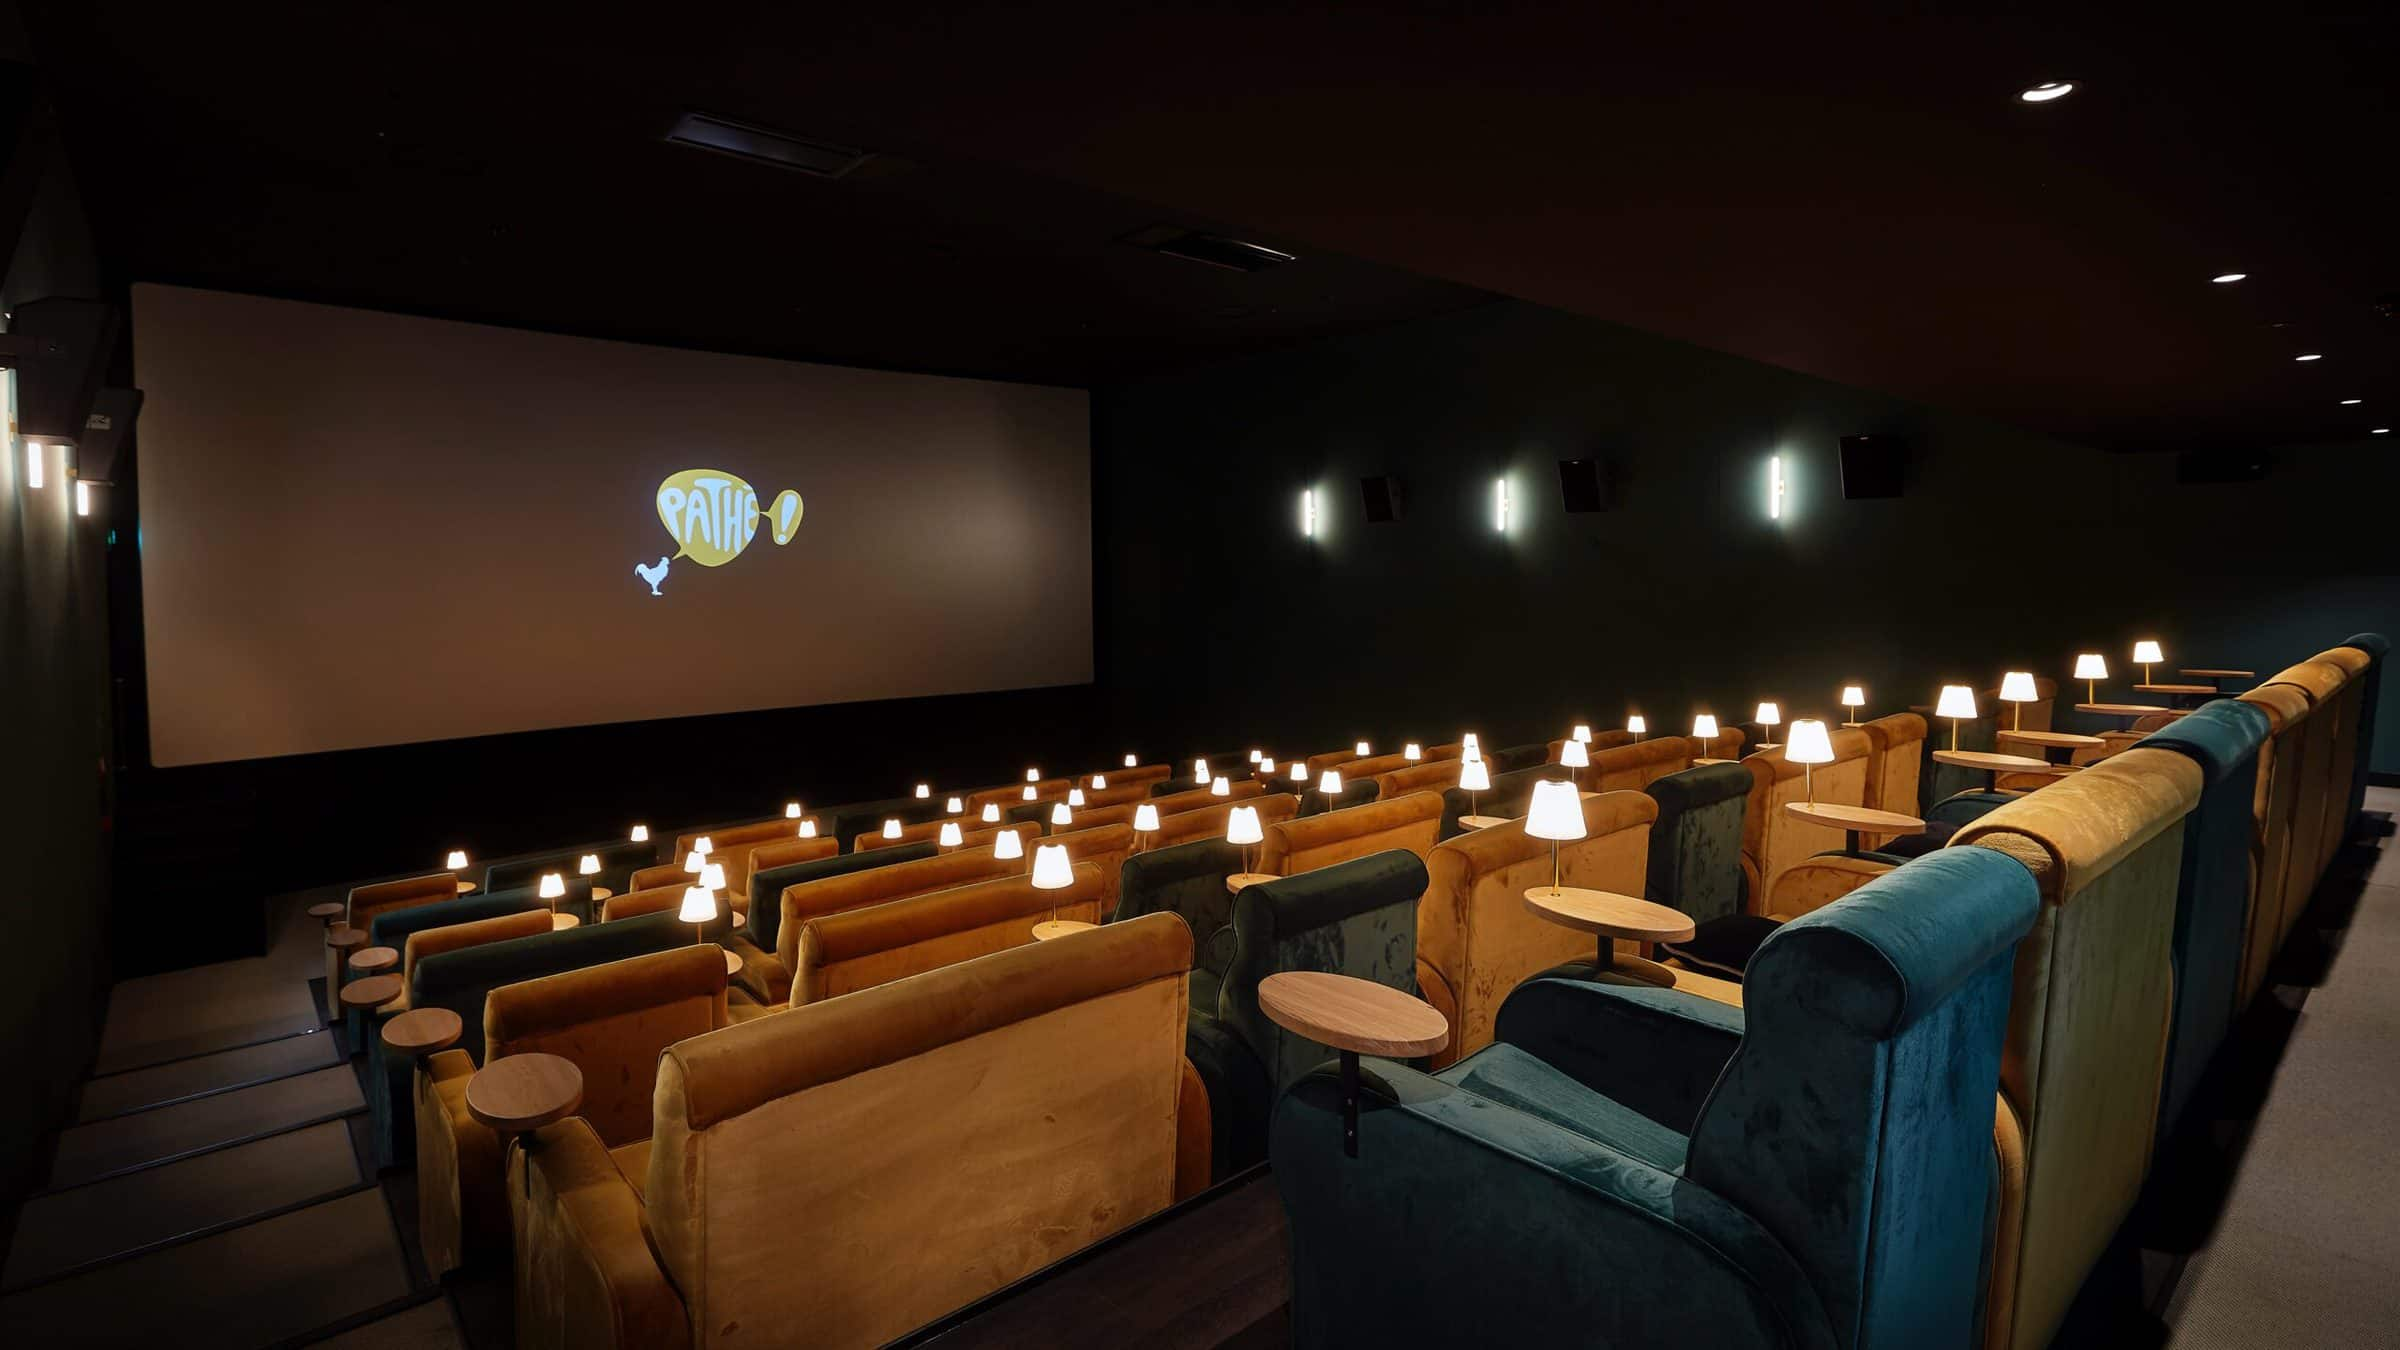 Pathe Tuschinski filmzaal met schemerlampjes, bankjes en ruime stoelen